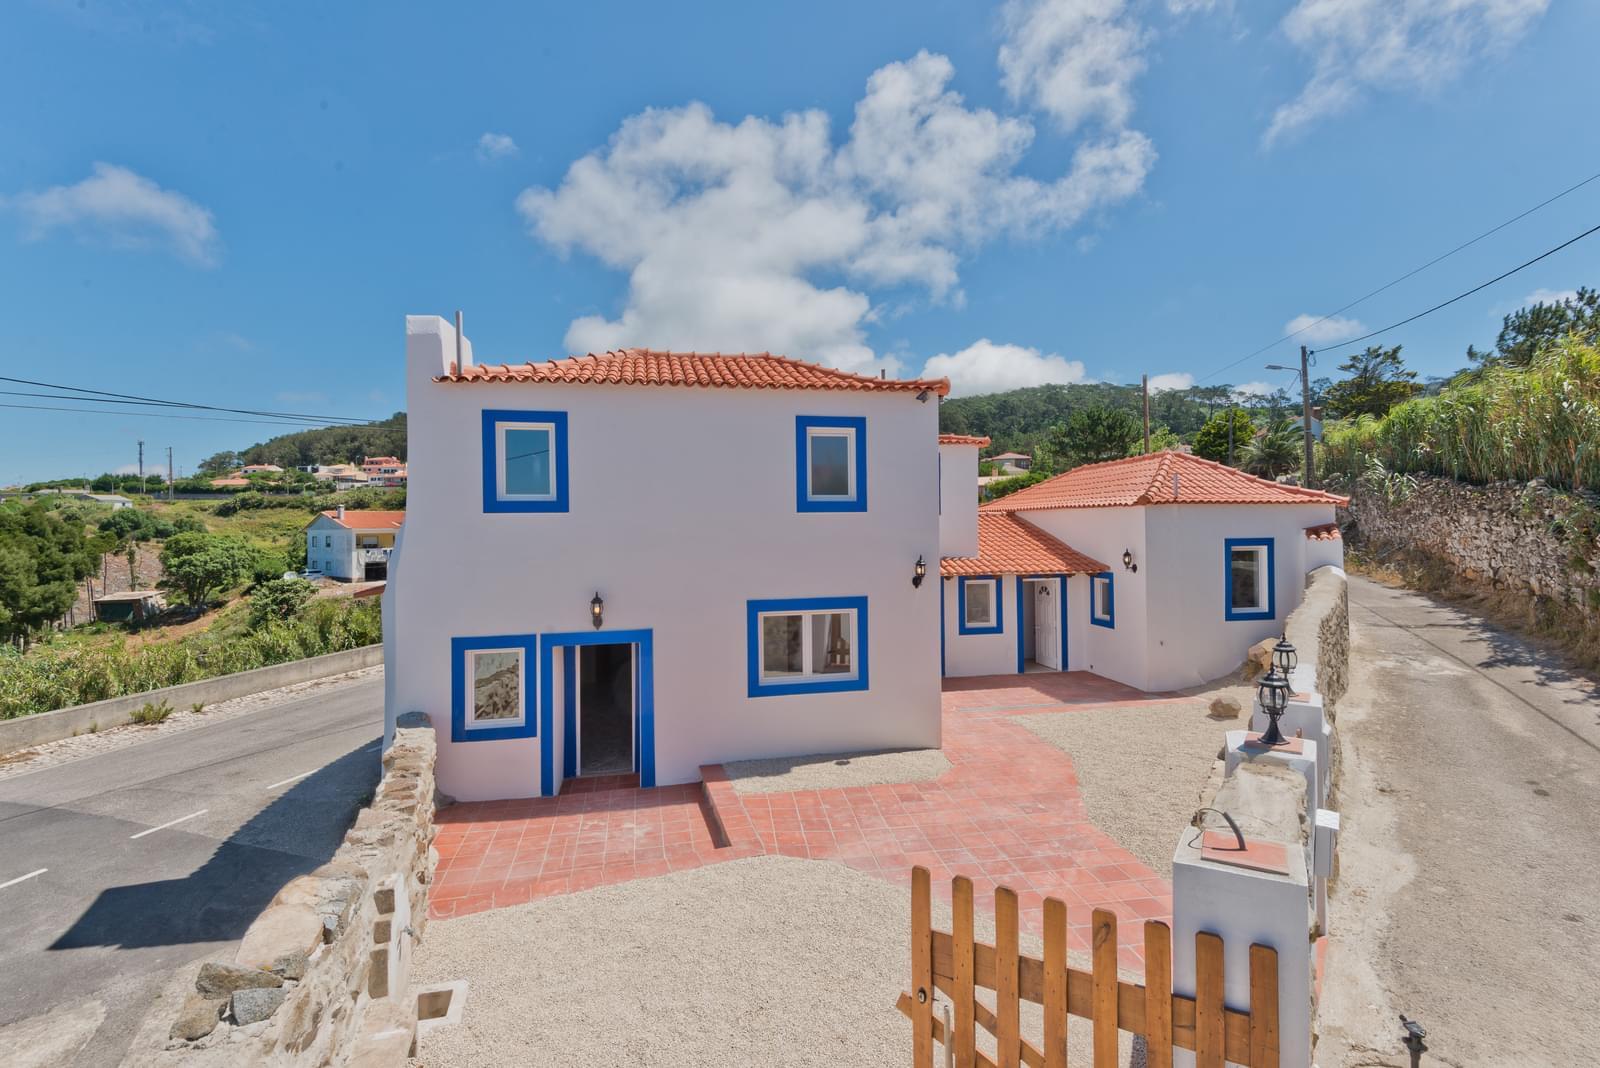 3 bedroom villa with parking